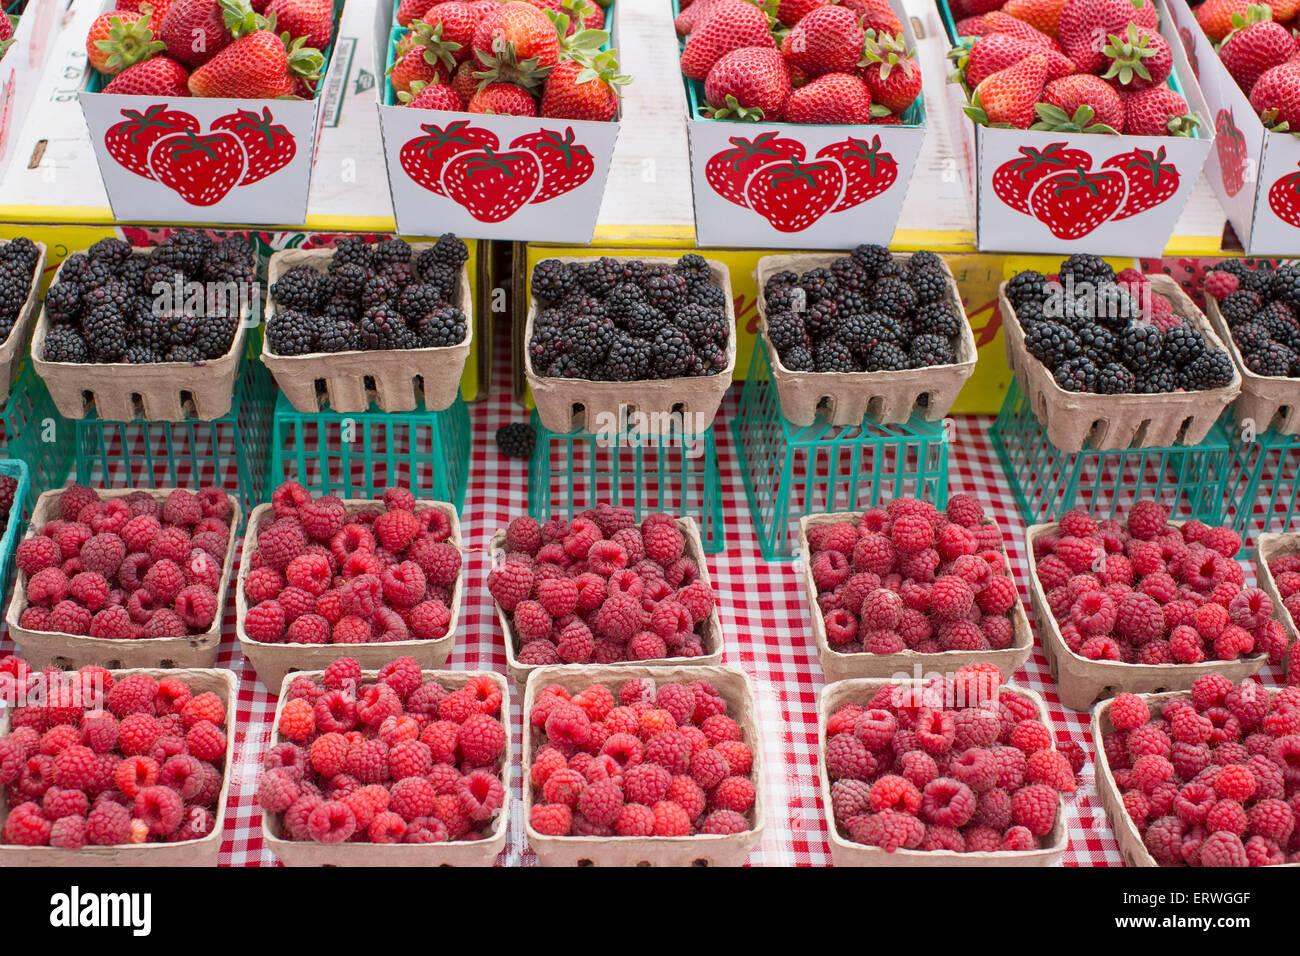 Baskets of fresh organic strawberries, blackberries and raspberries at San Francisco farmer's market. - Stock Image